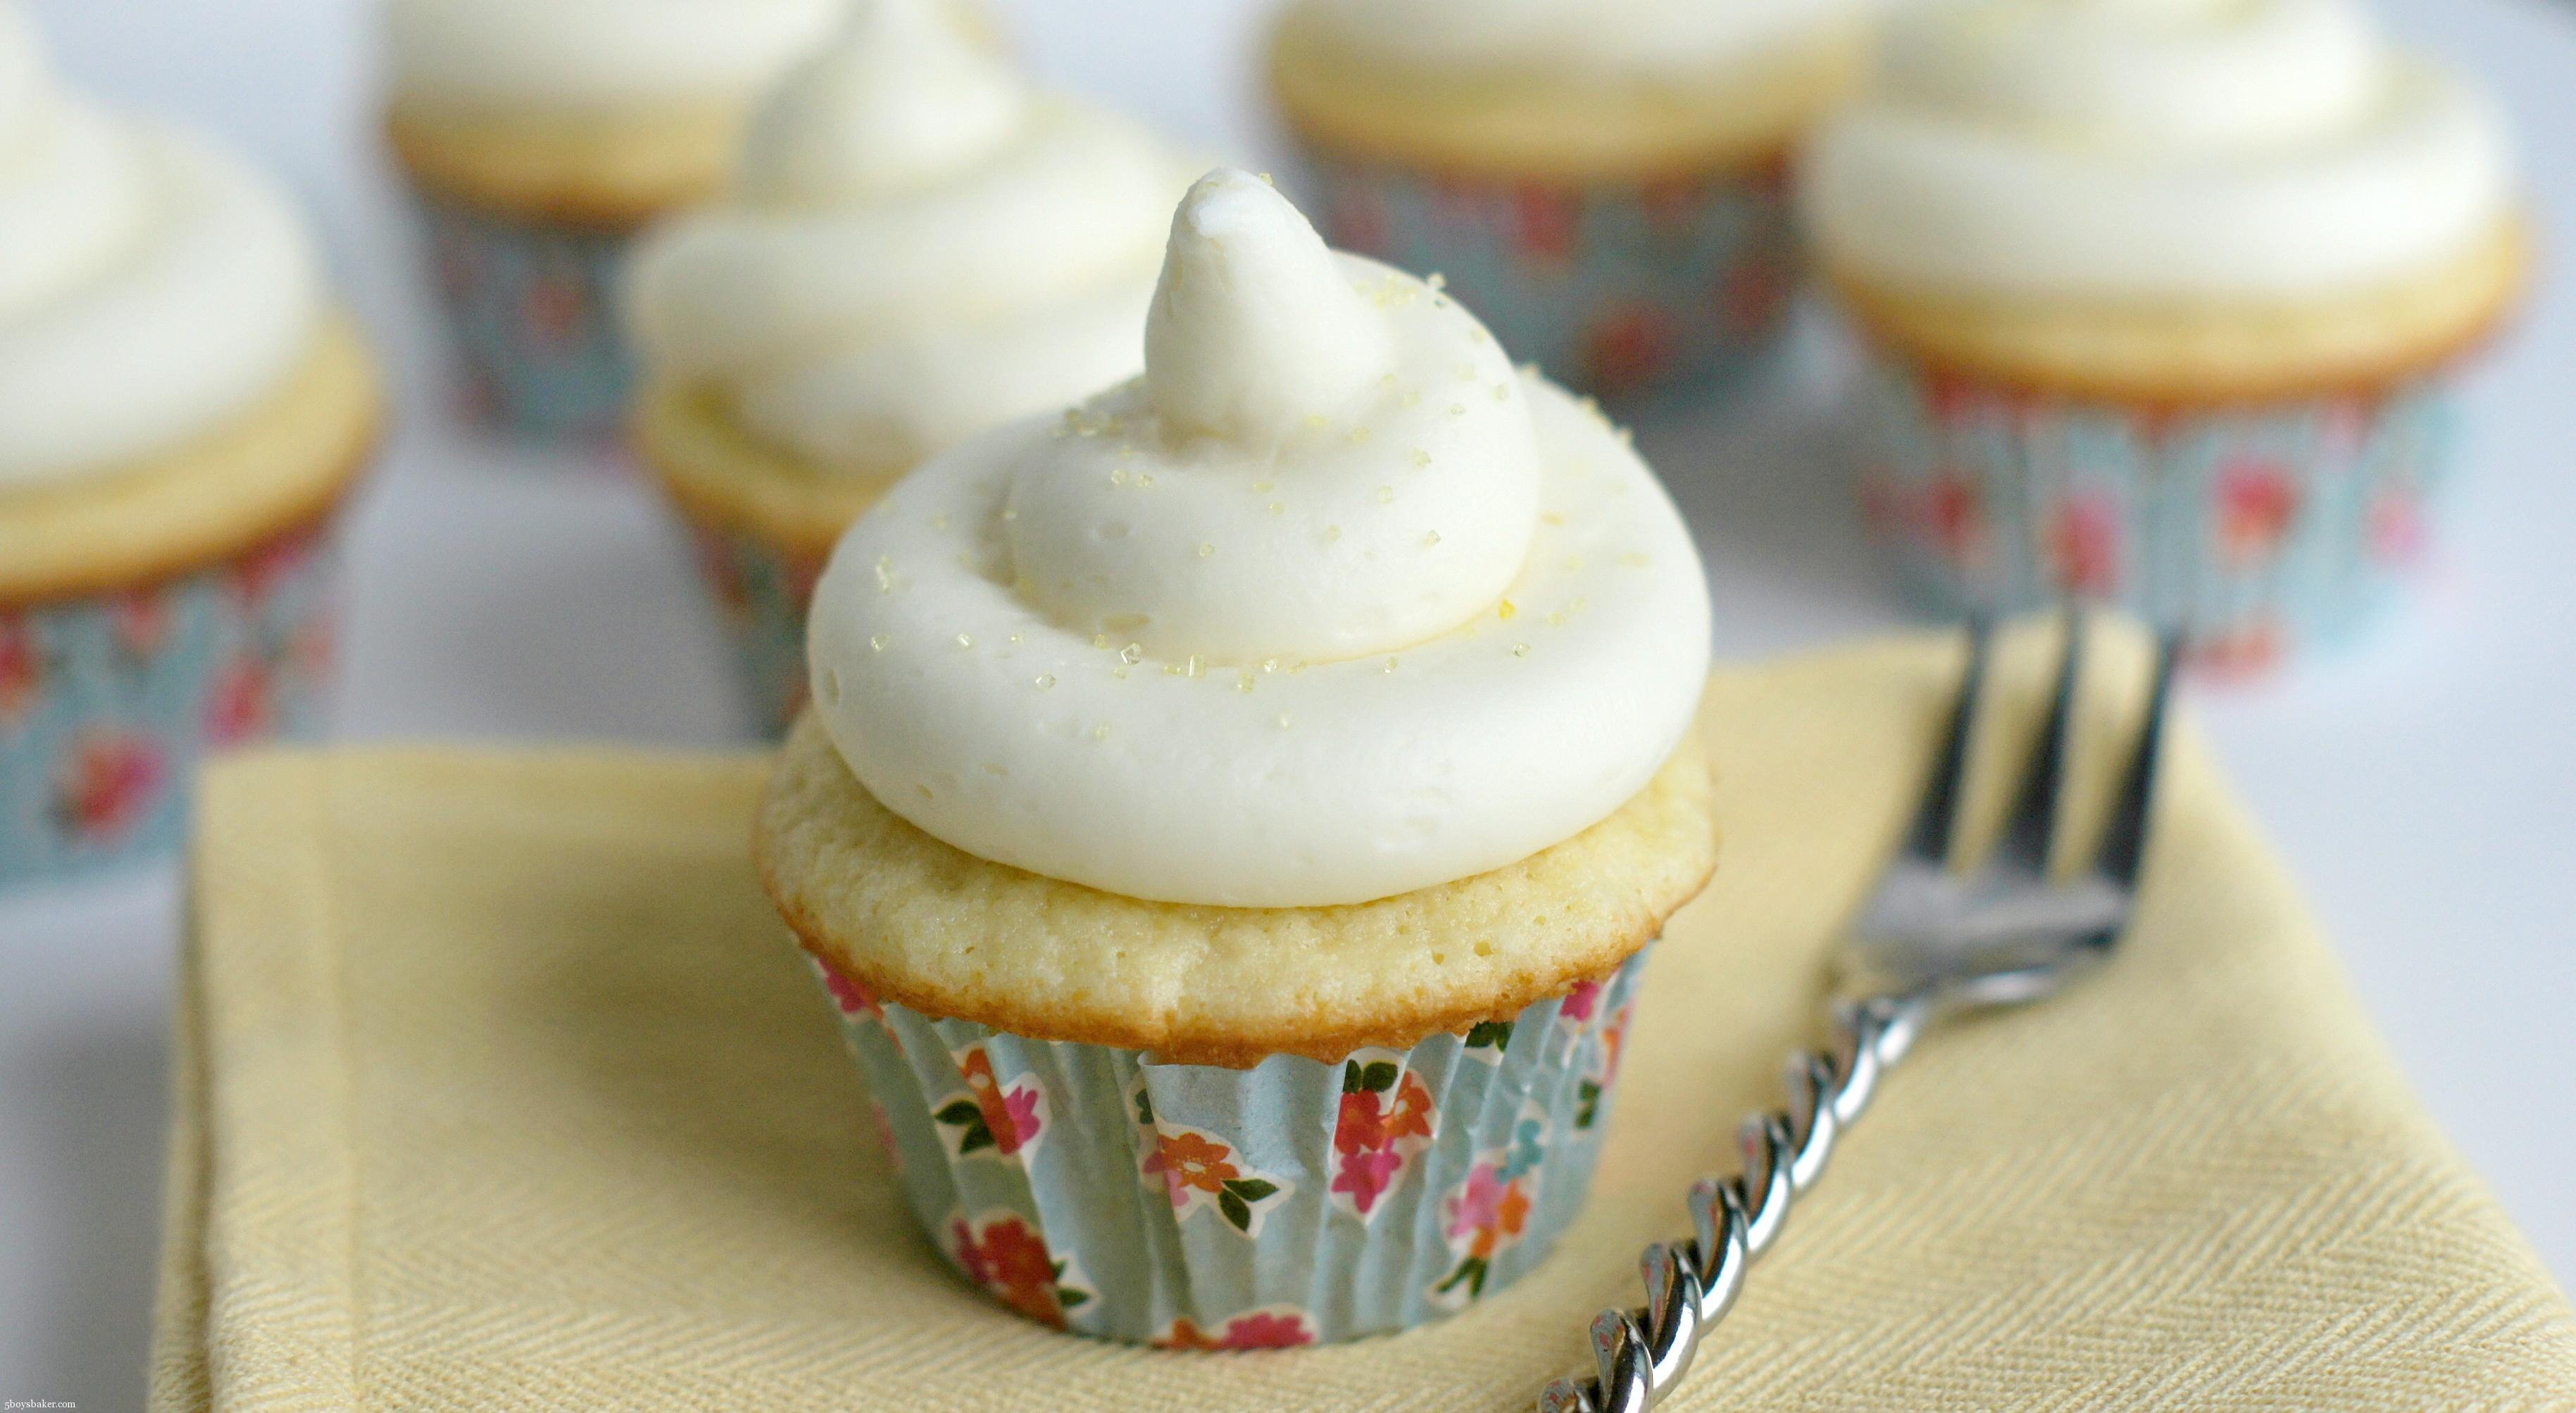 Boys Baker Coconut Cupcakes with Lemon Buttercream Frosting - 5 Boys ...